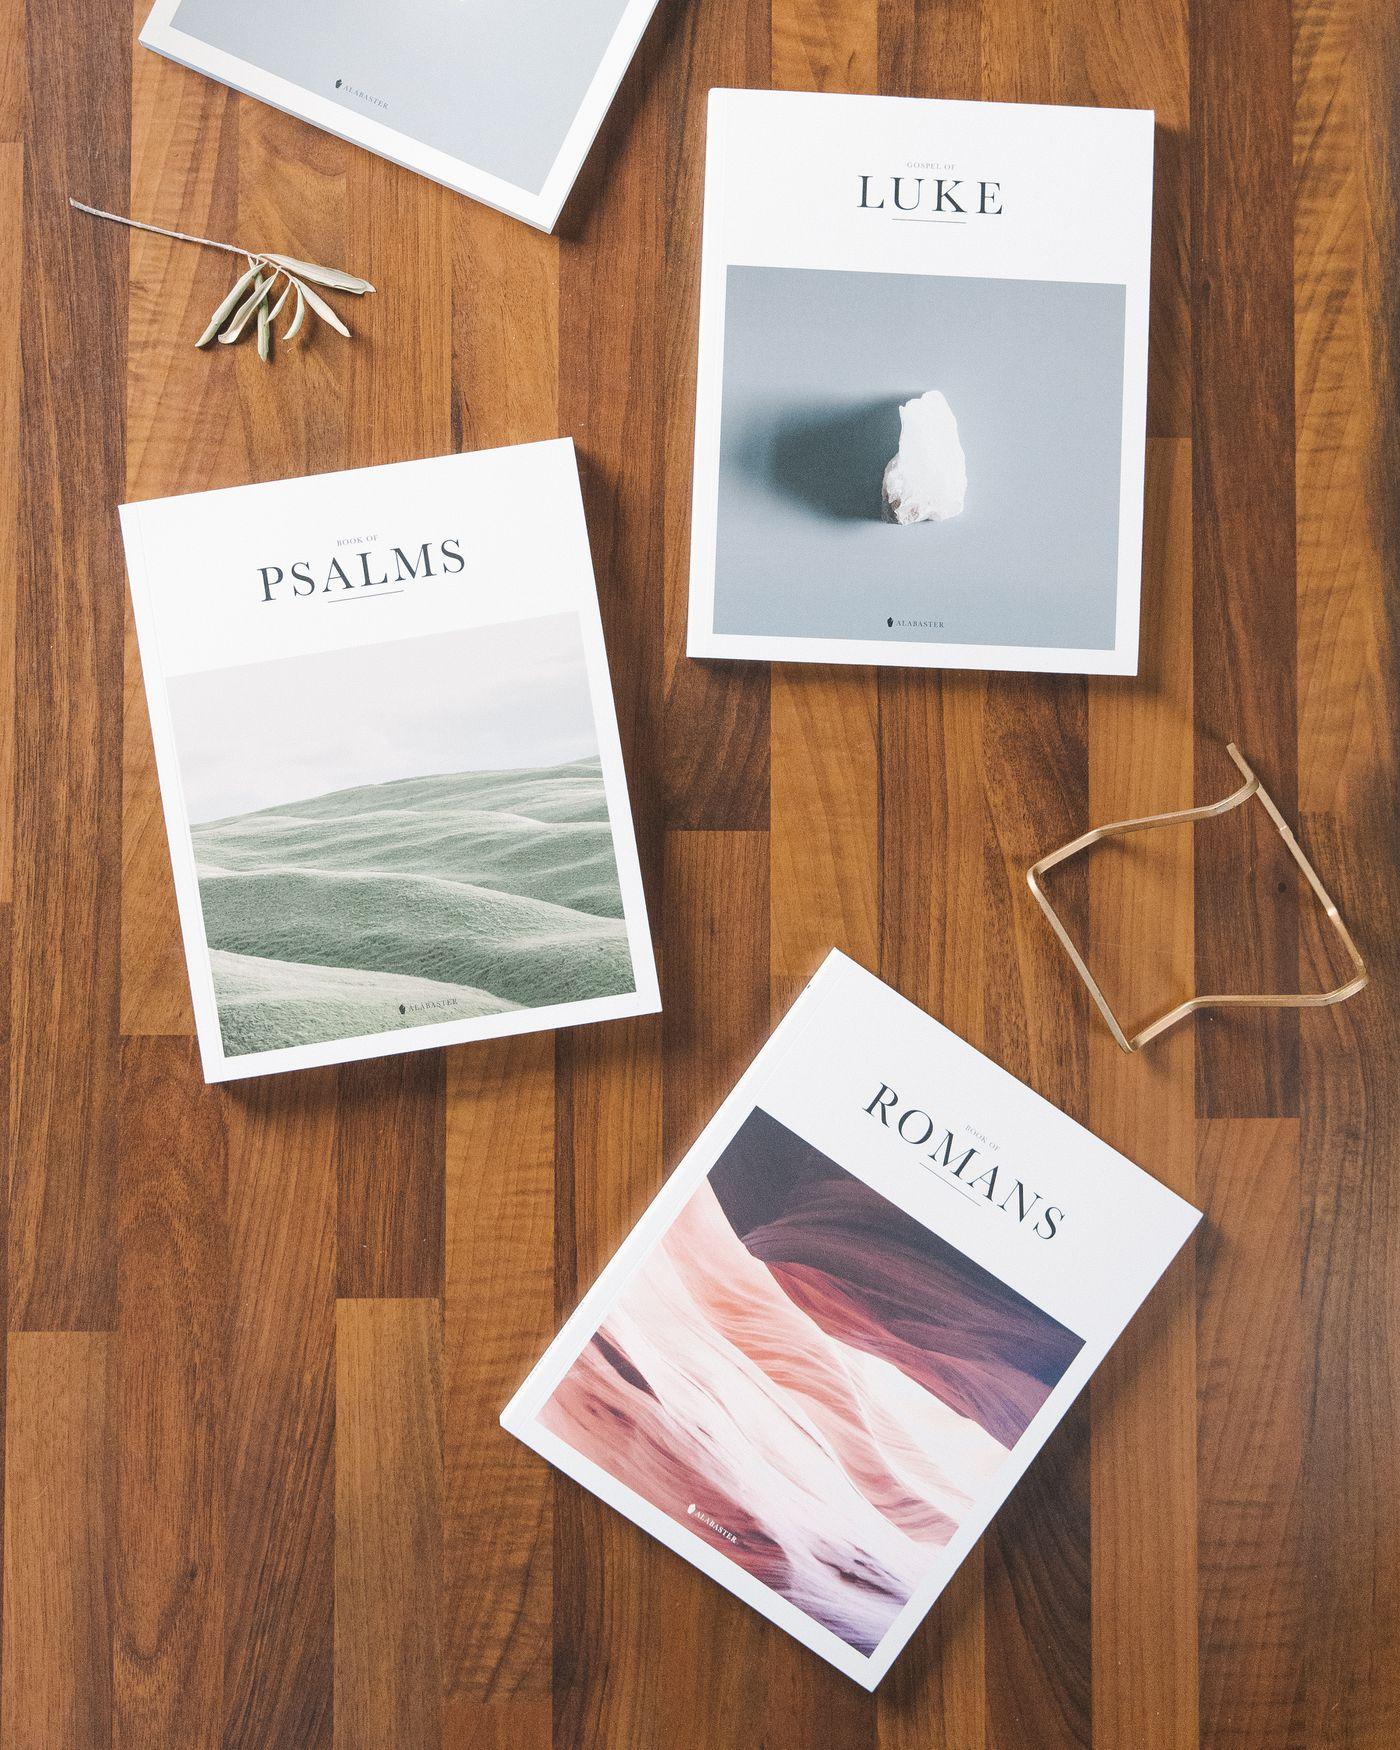 Instagram-friendly Bibles are here to court millennials - Vox